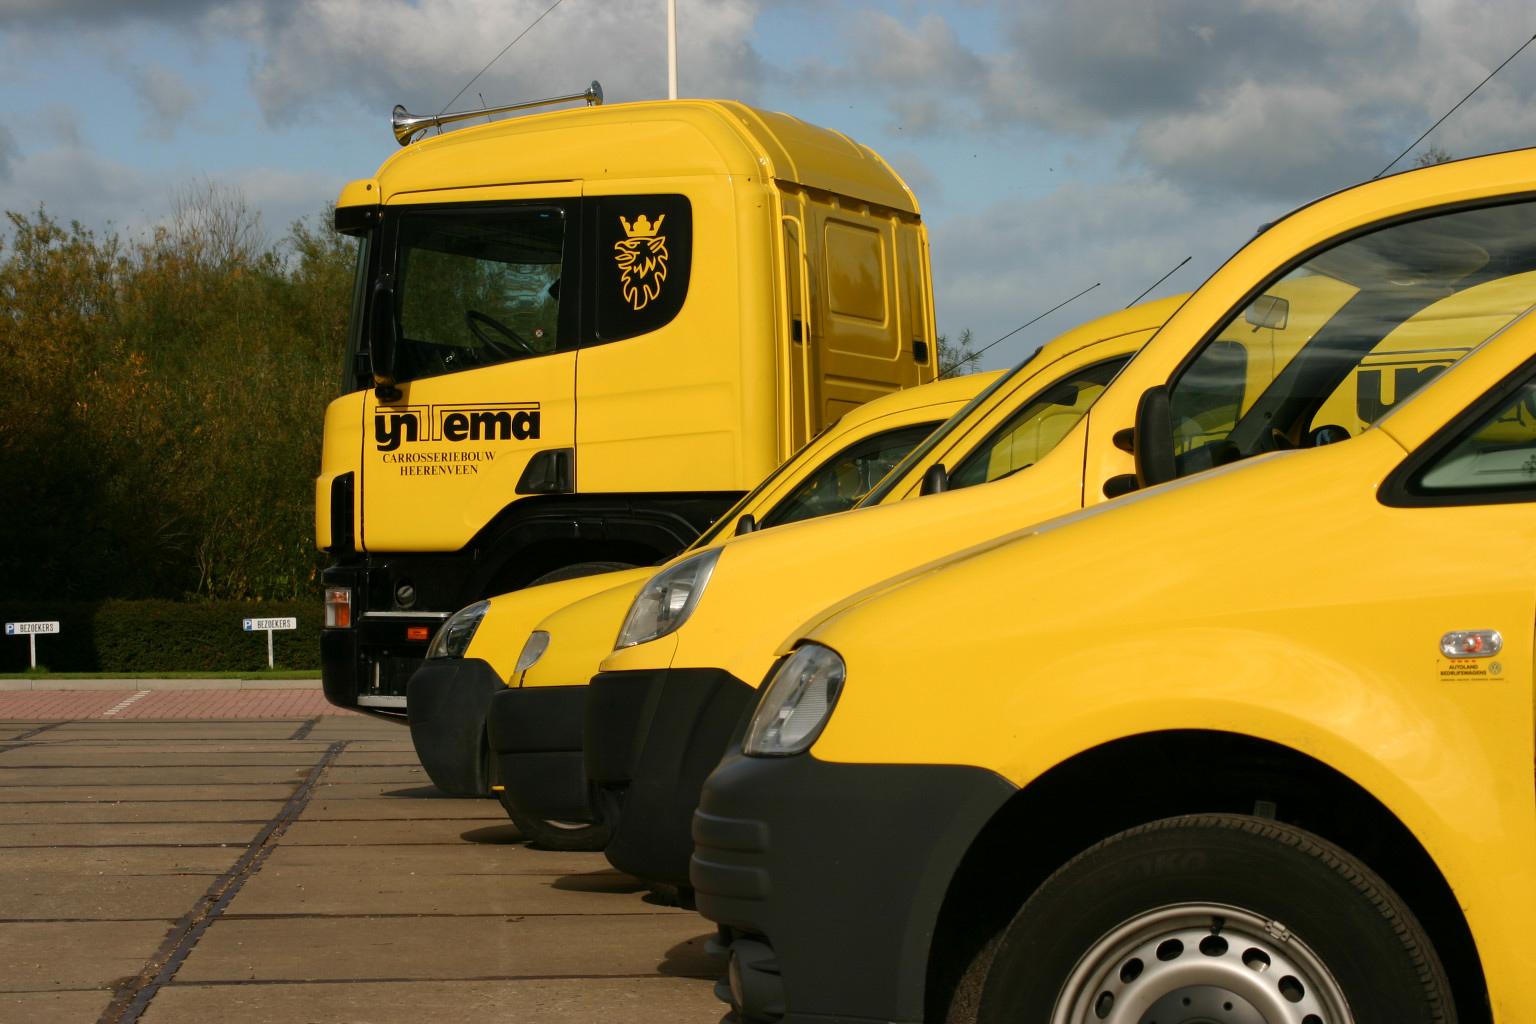 Servicewagens 24-uurs service pech hulp IJntema